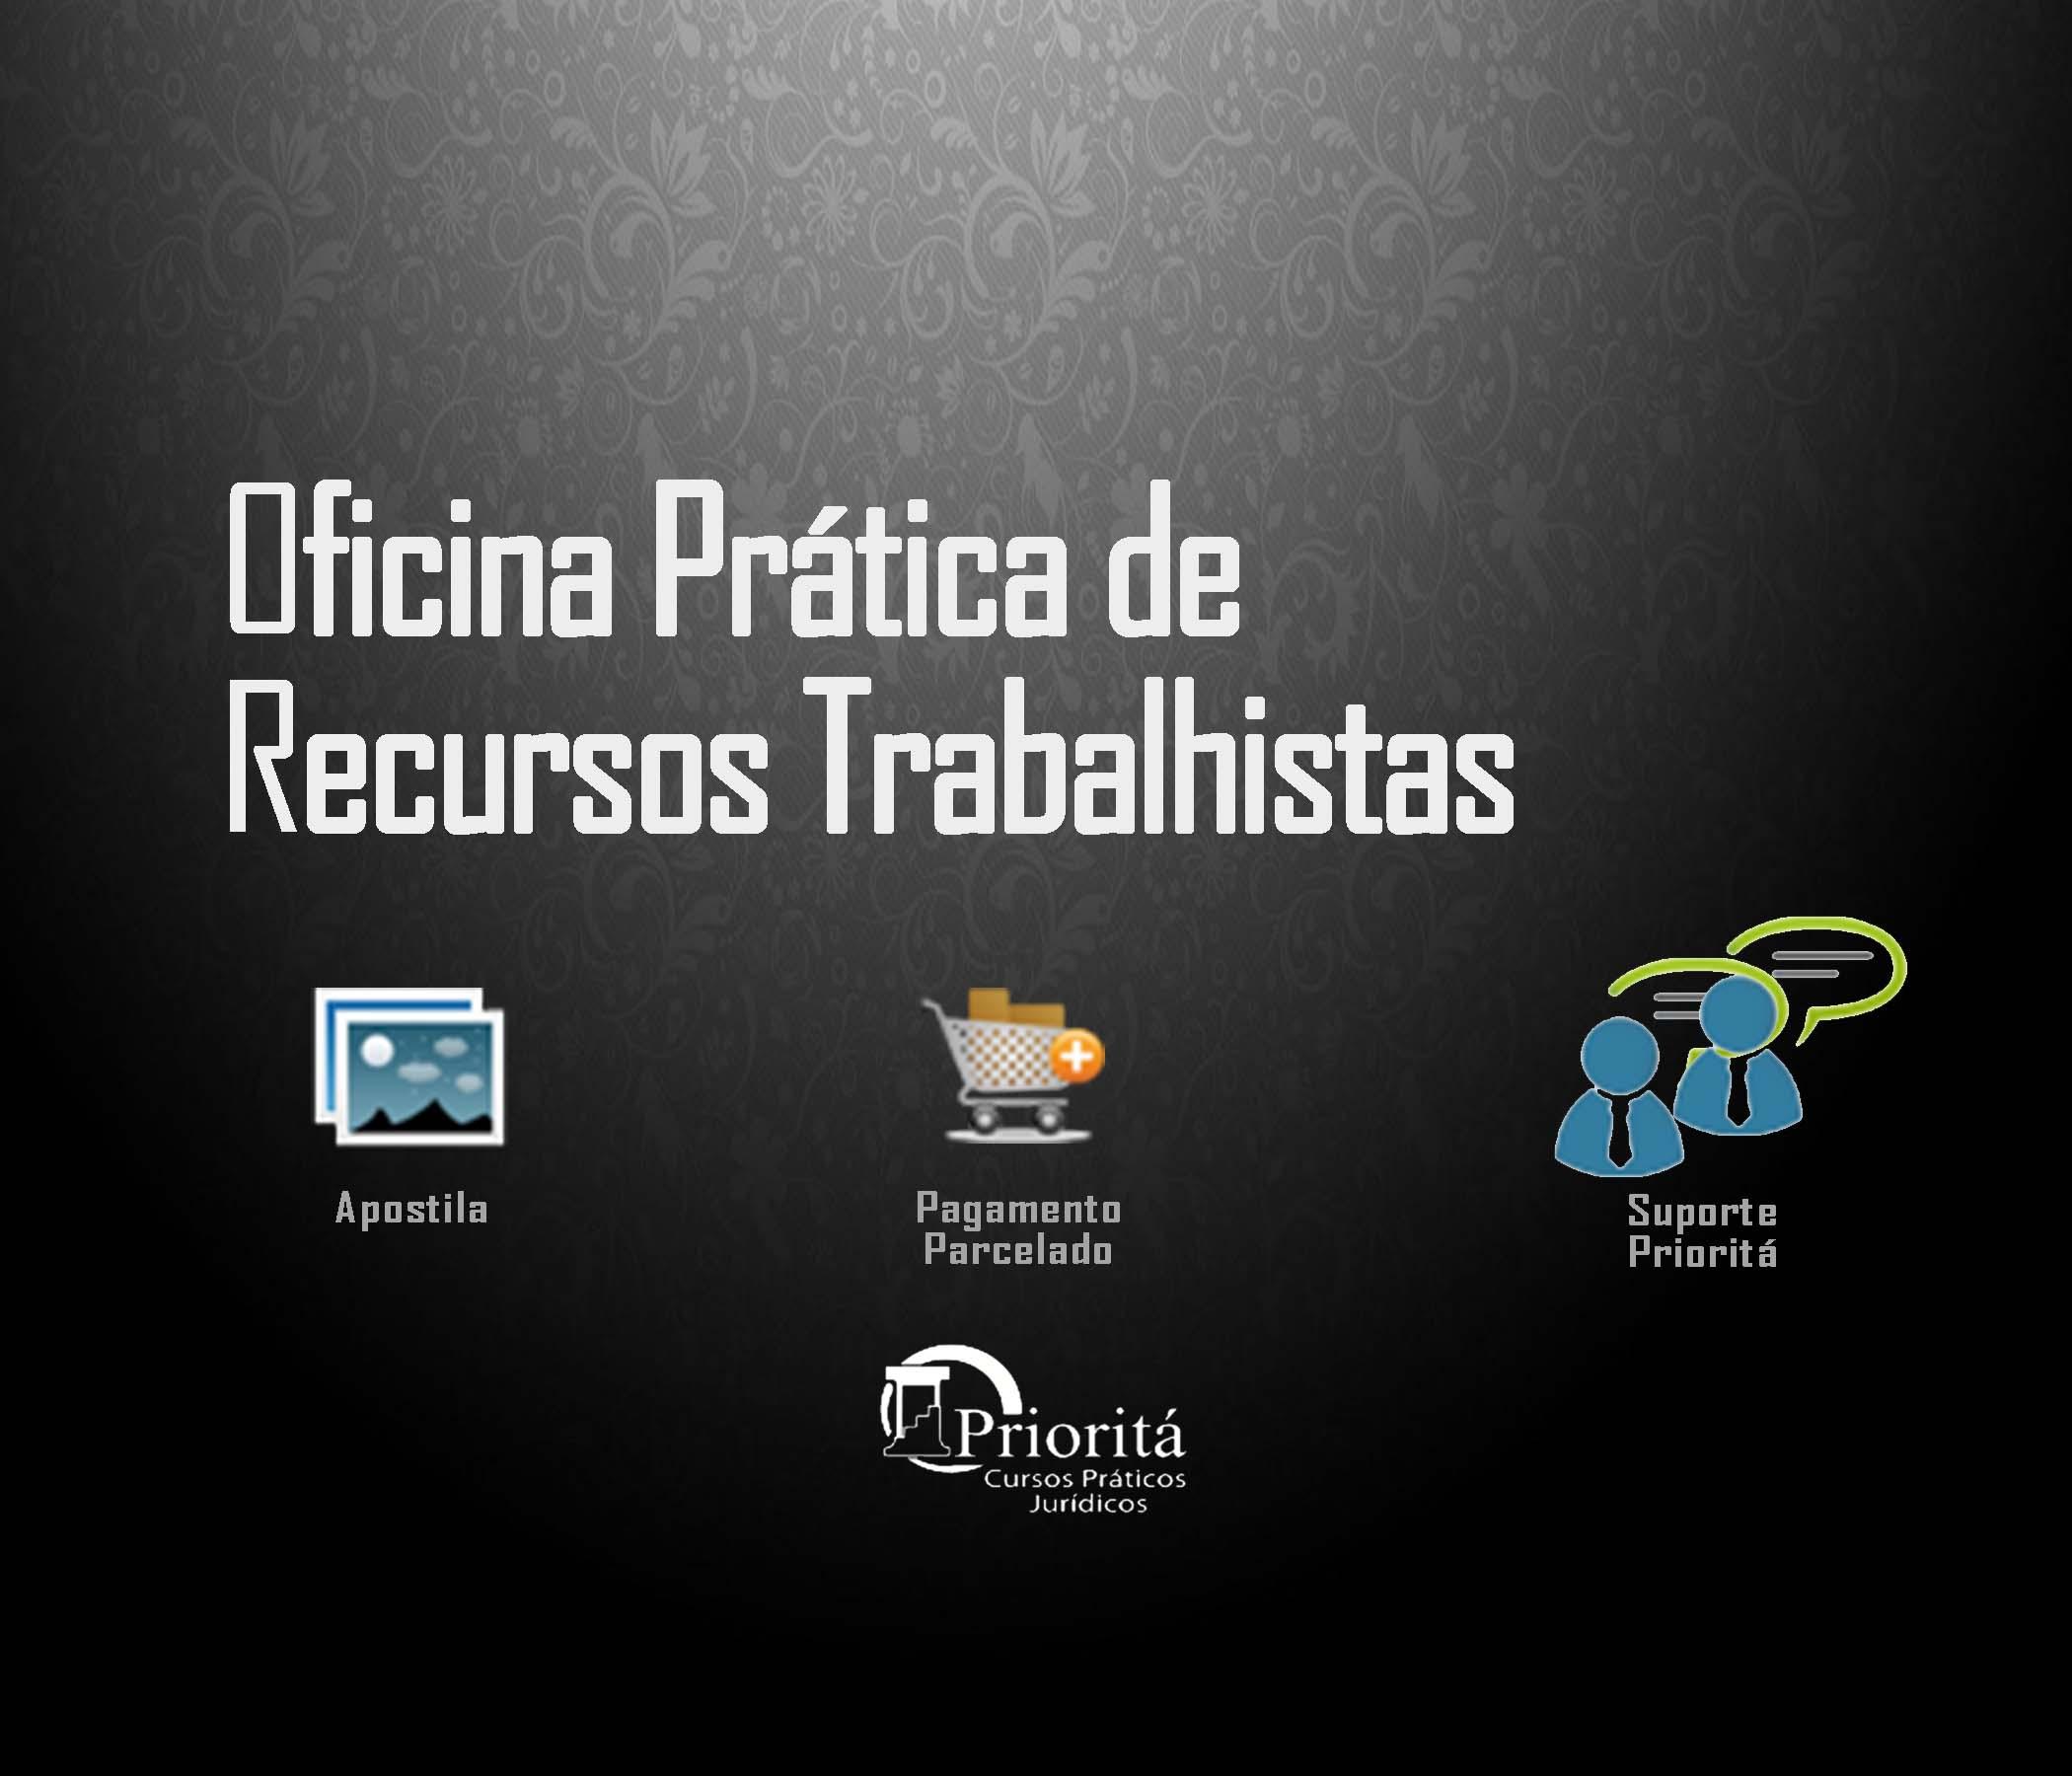 recursos trabalhistas